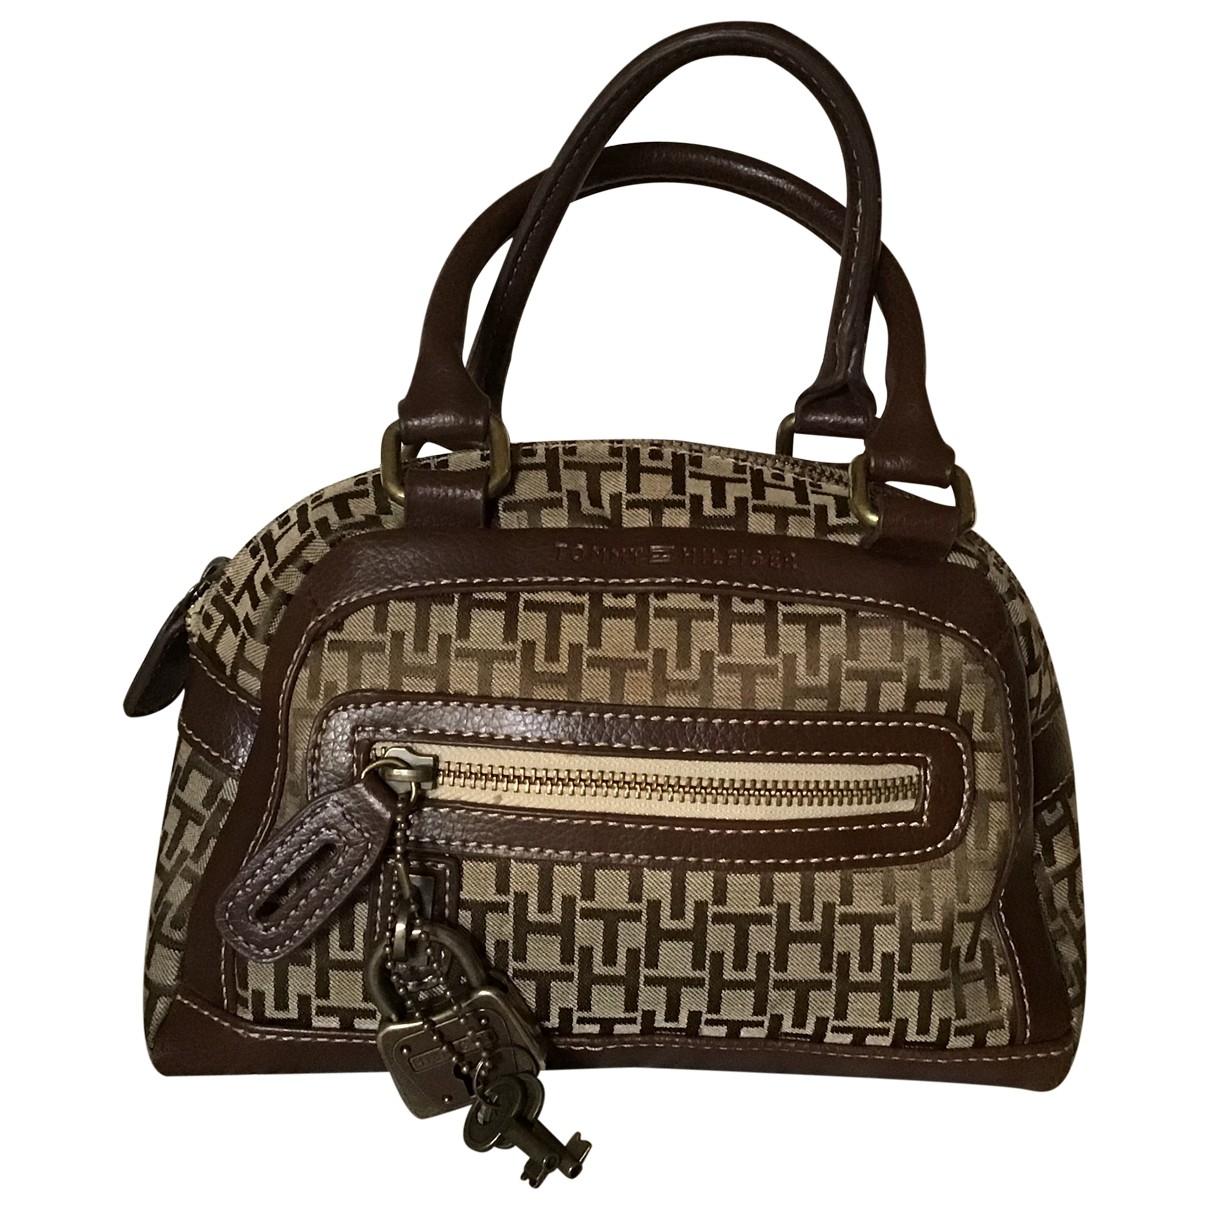 Tommy Hilfiger \N Brown Leather handbag for Women \N